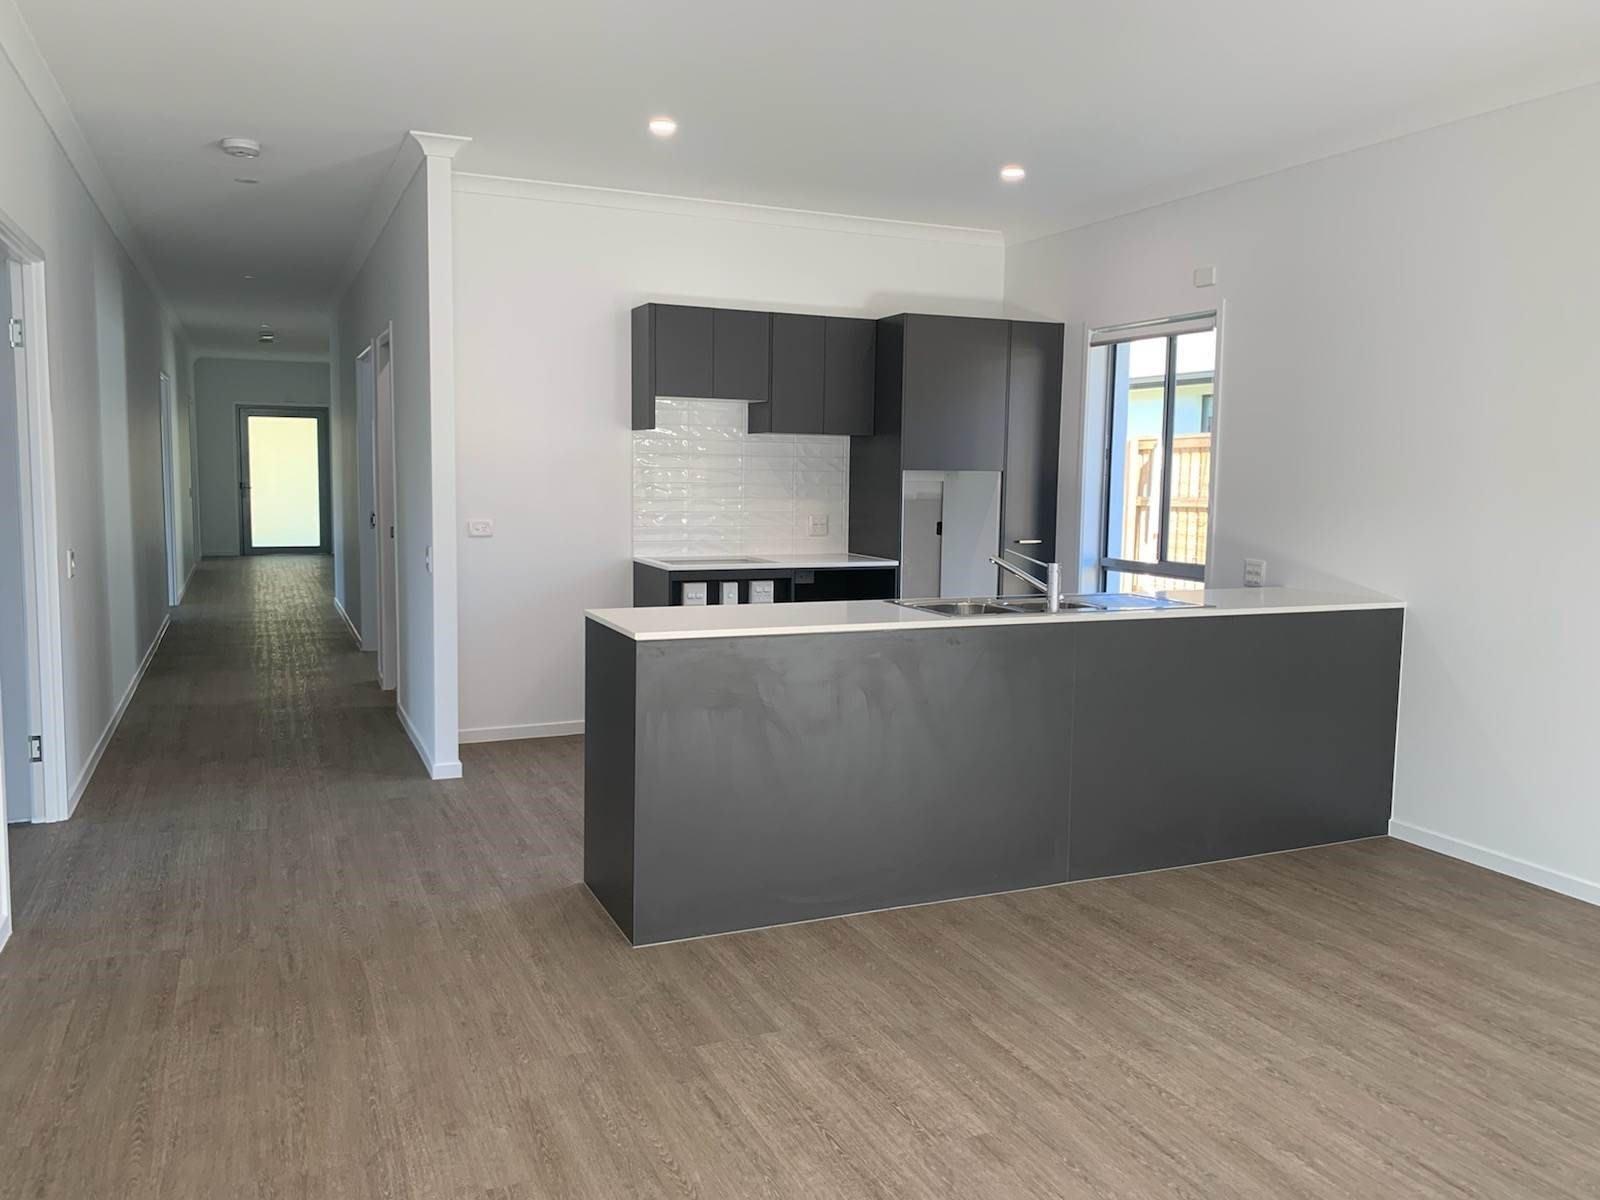 Medium Term Accommodation Kitchen